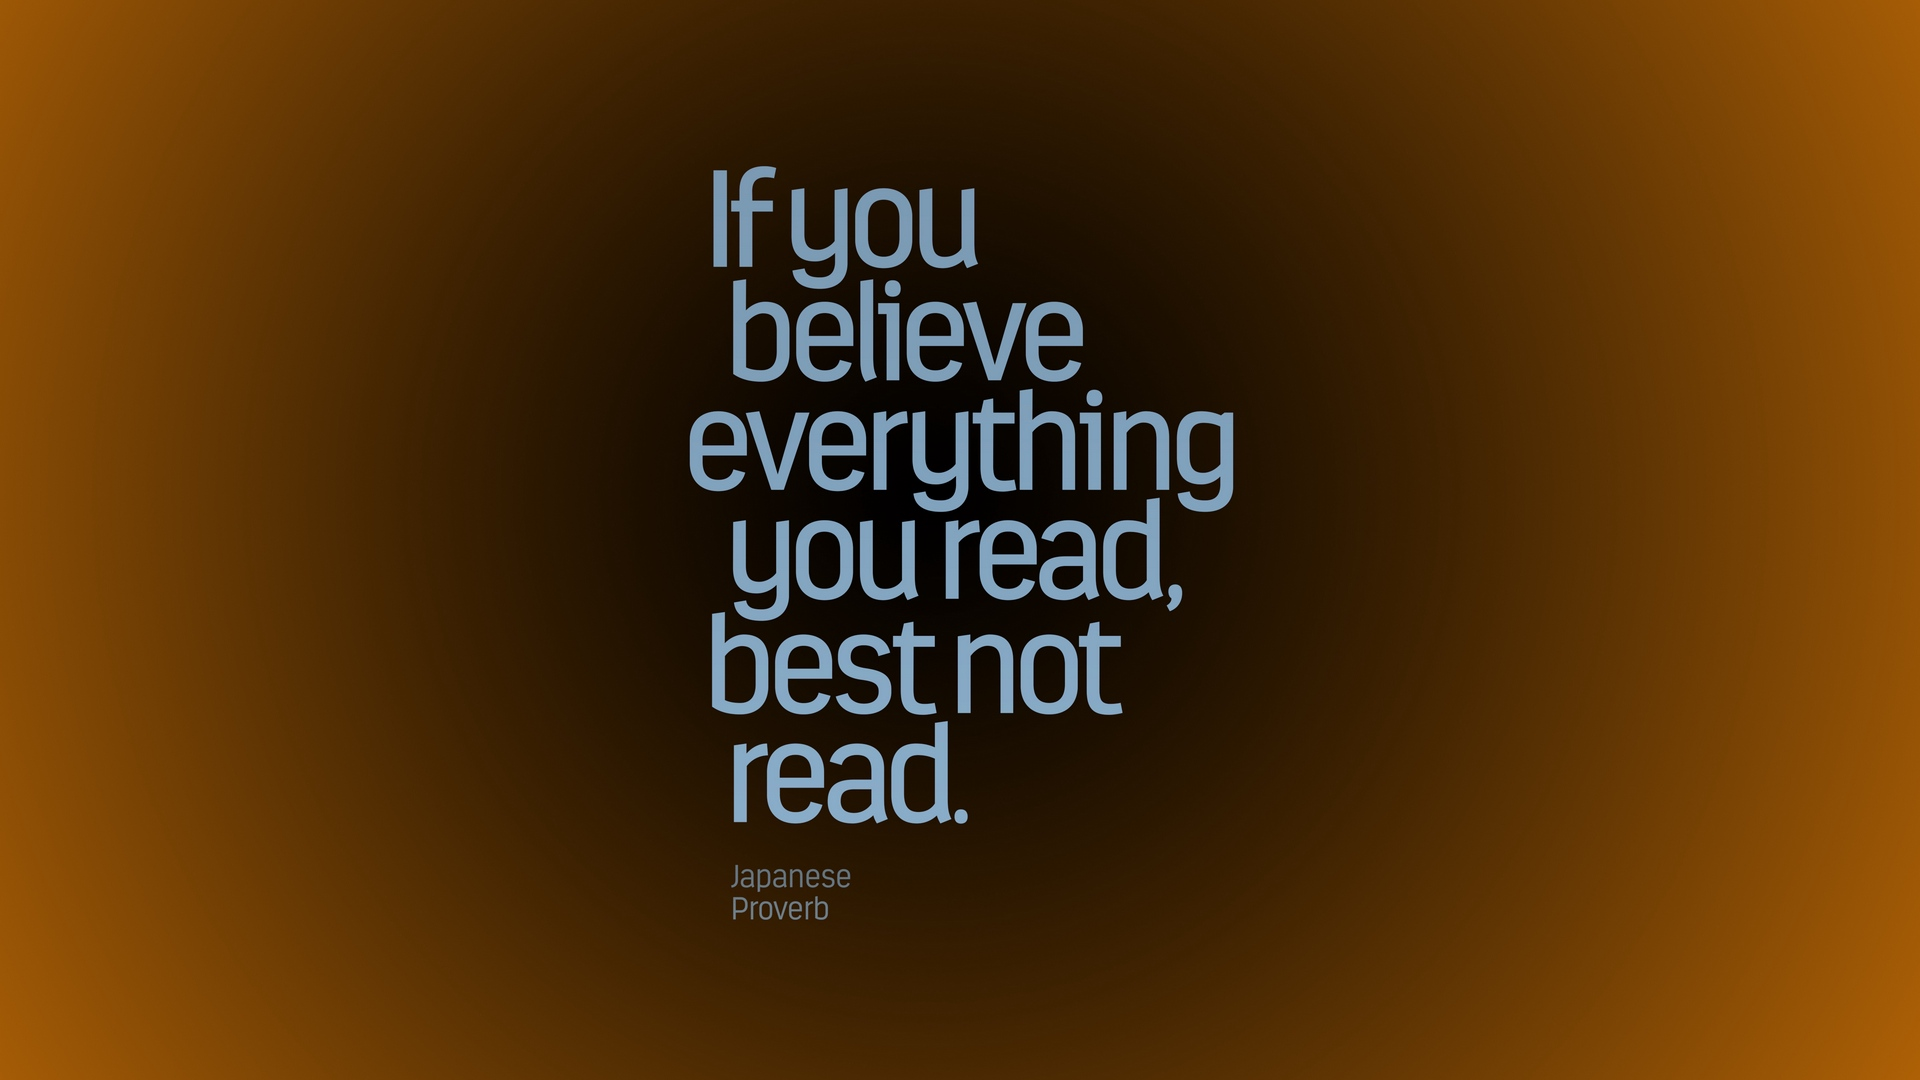 Download wallpaper 1920x1080 inscription proverb advice wisdom 1920x1080